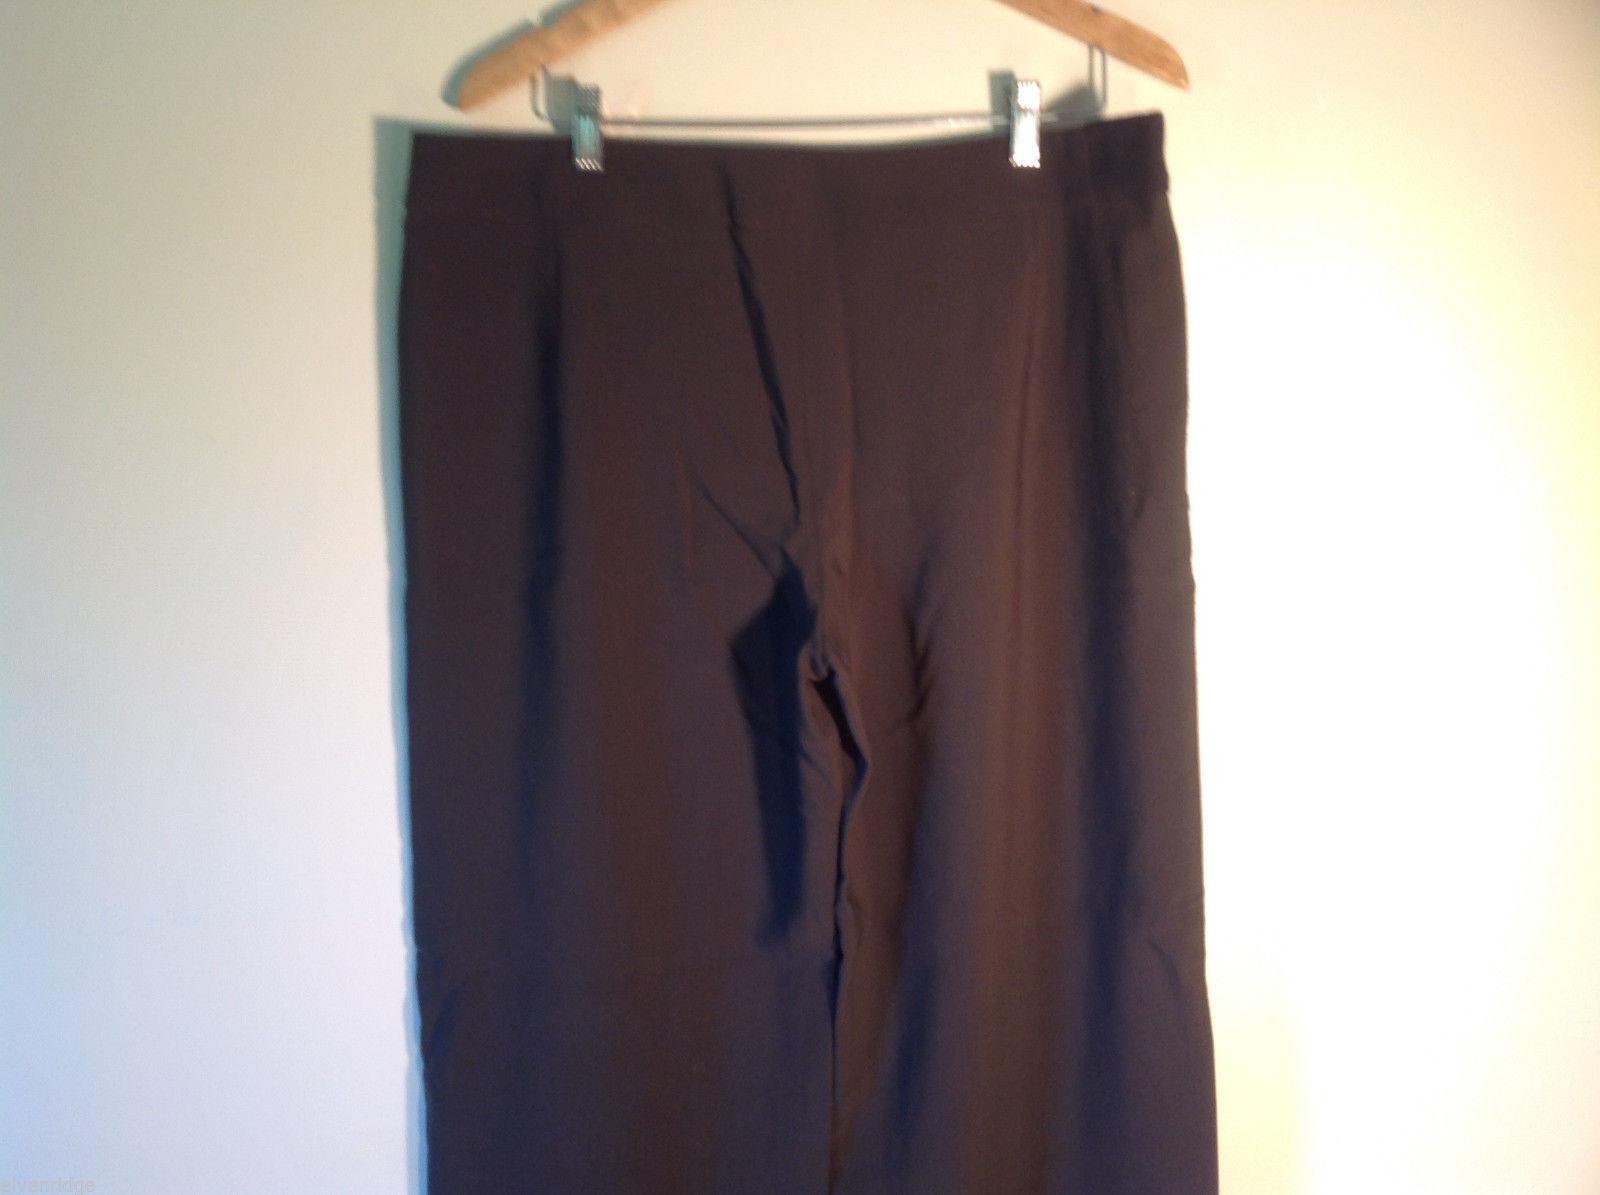 Womens Giorgio Armani Dark Brown Flat Front Trouser Dress Pants Slacks ITALY image 4